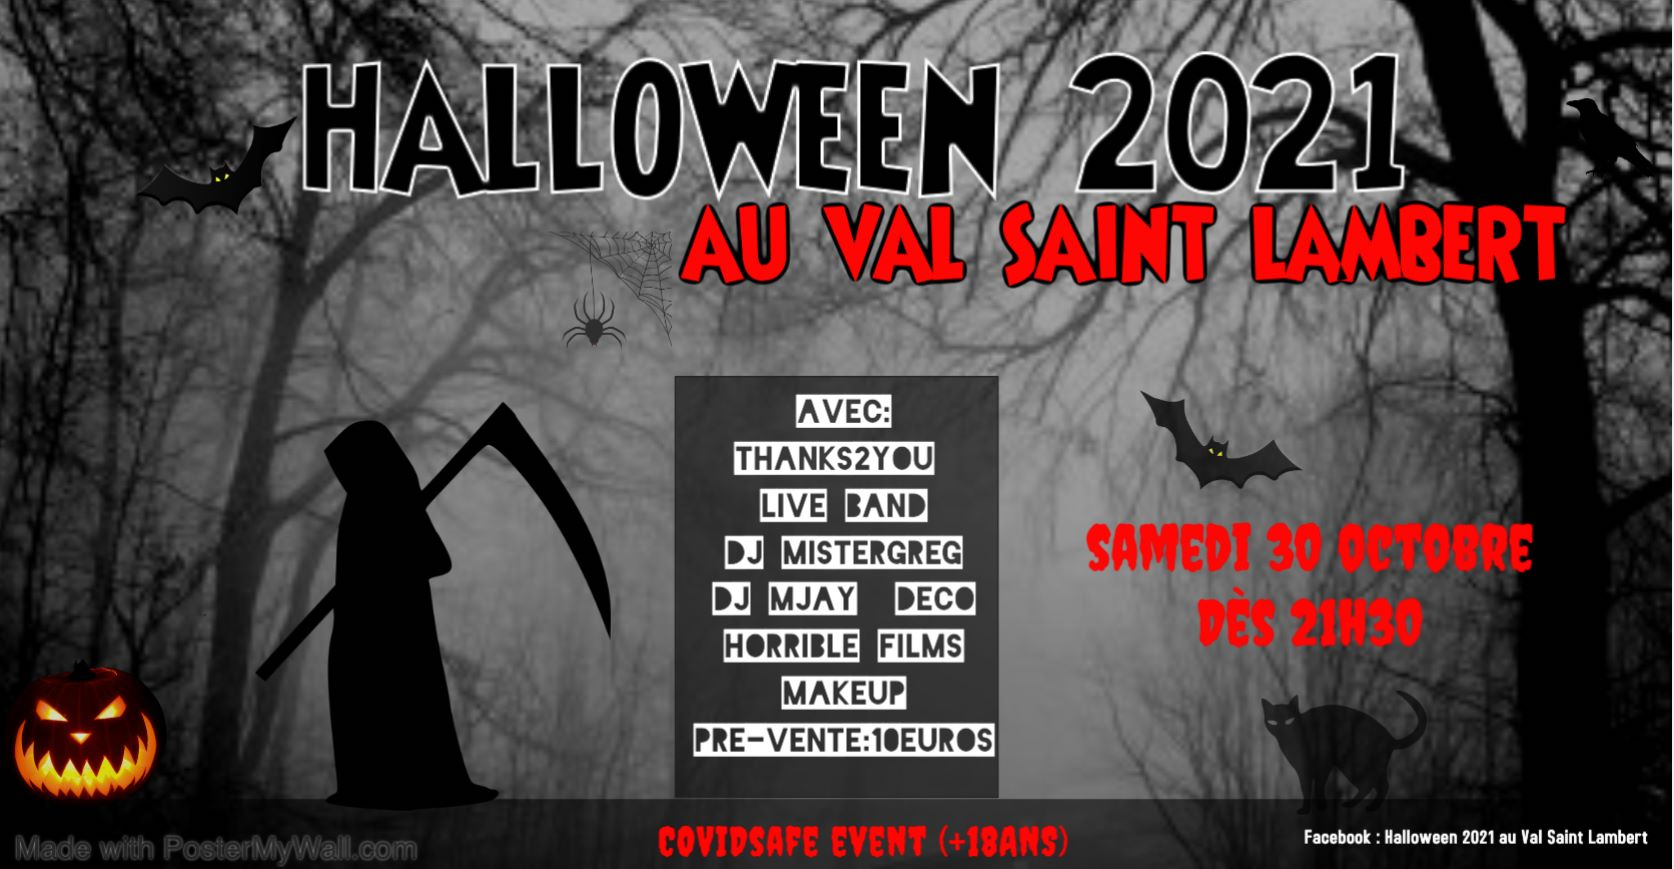 Halloween 2021 au Val Saint Lambert